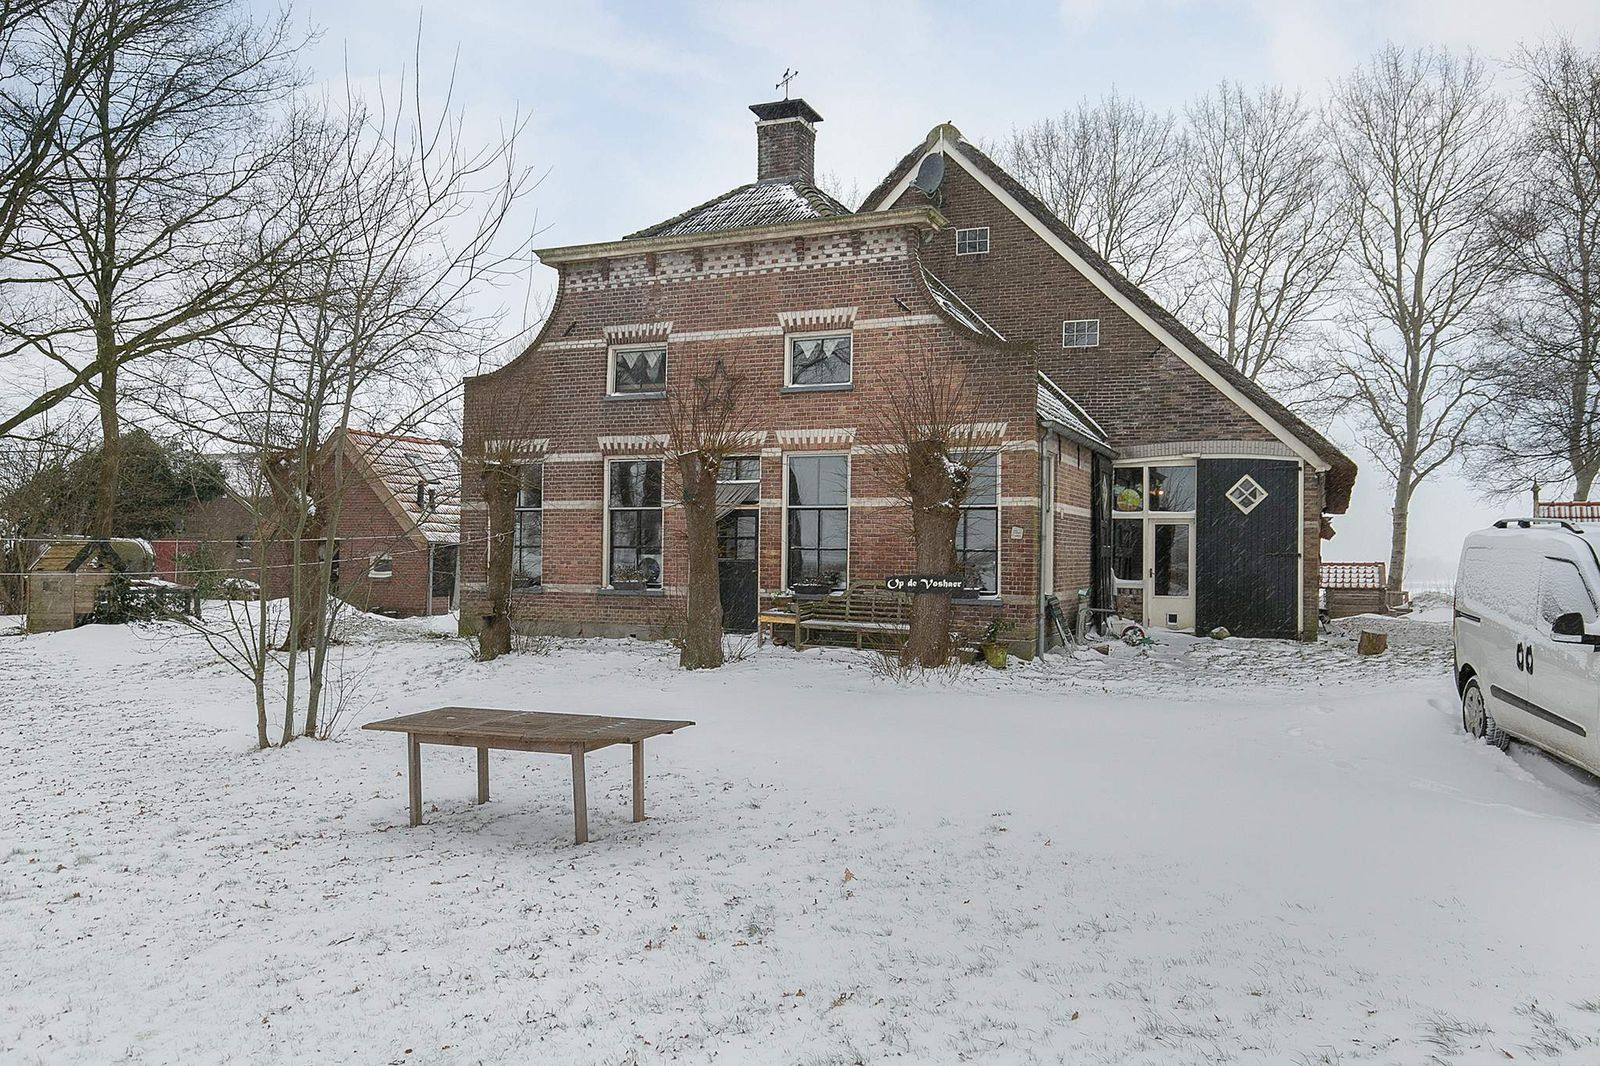 Eemster 39, Dwingeloo